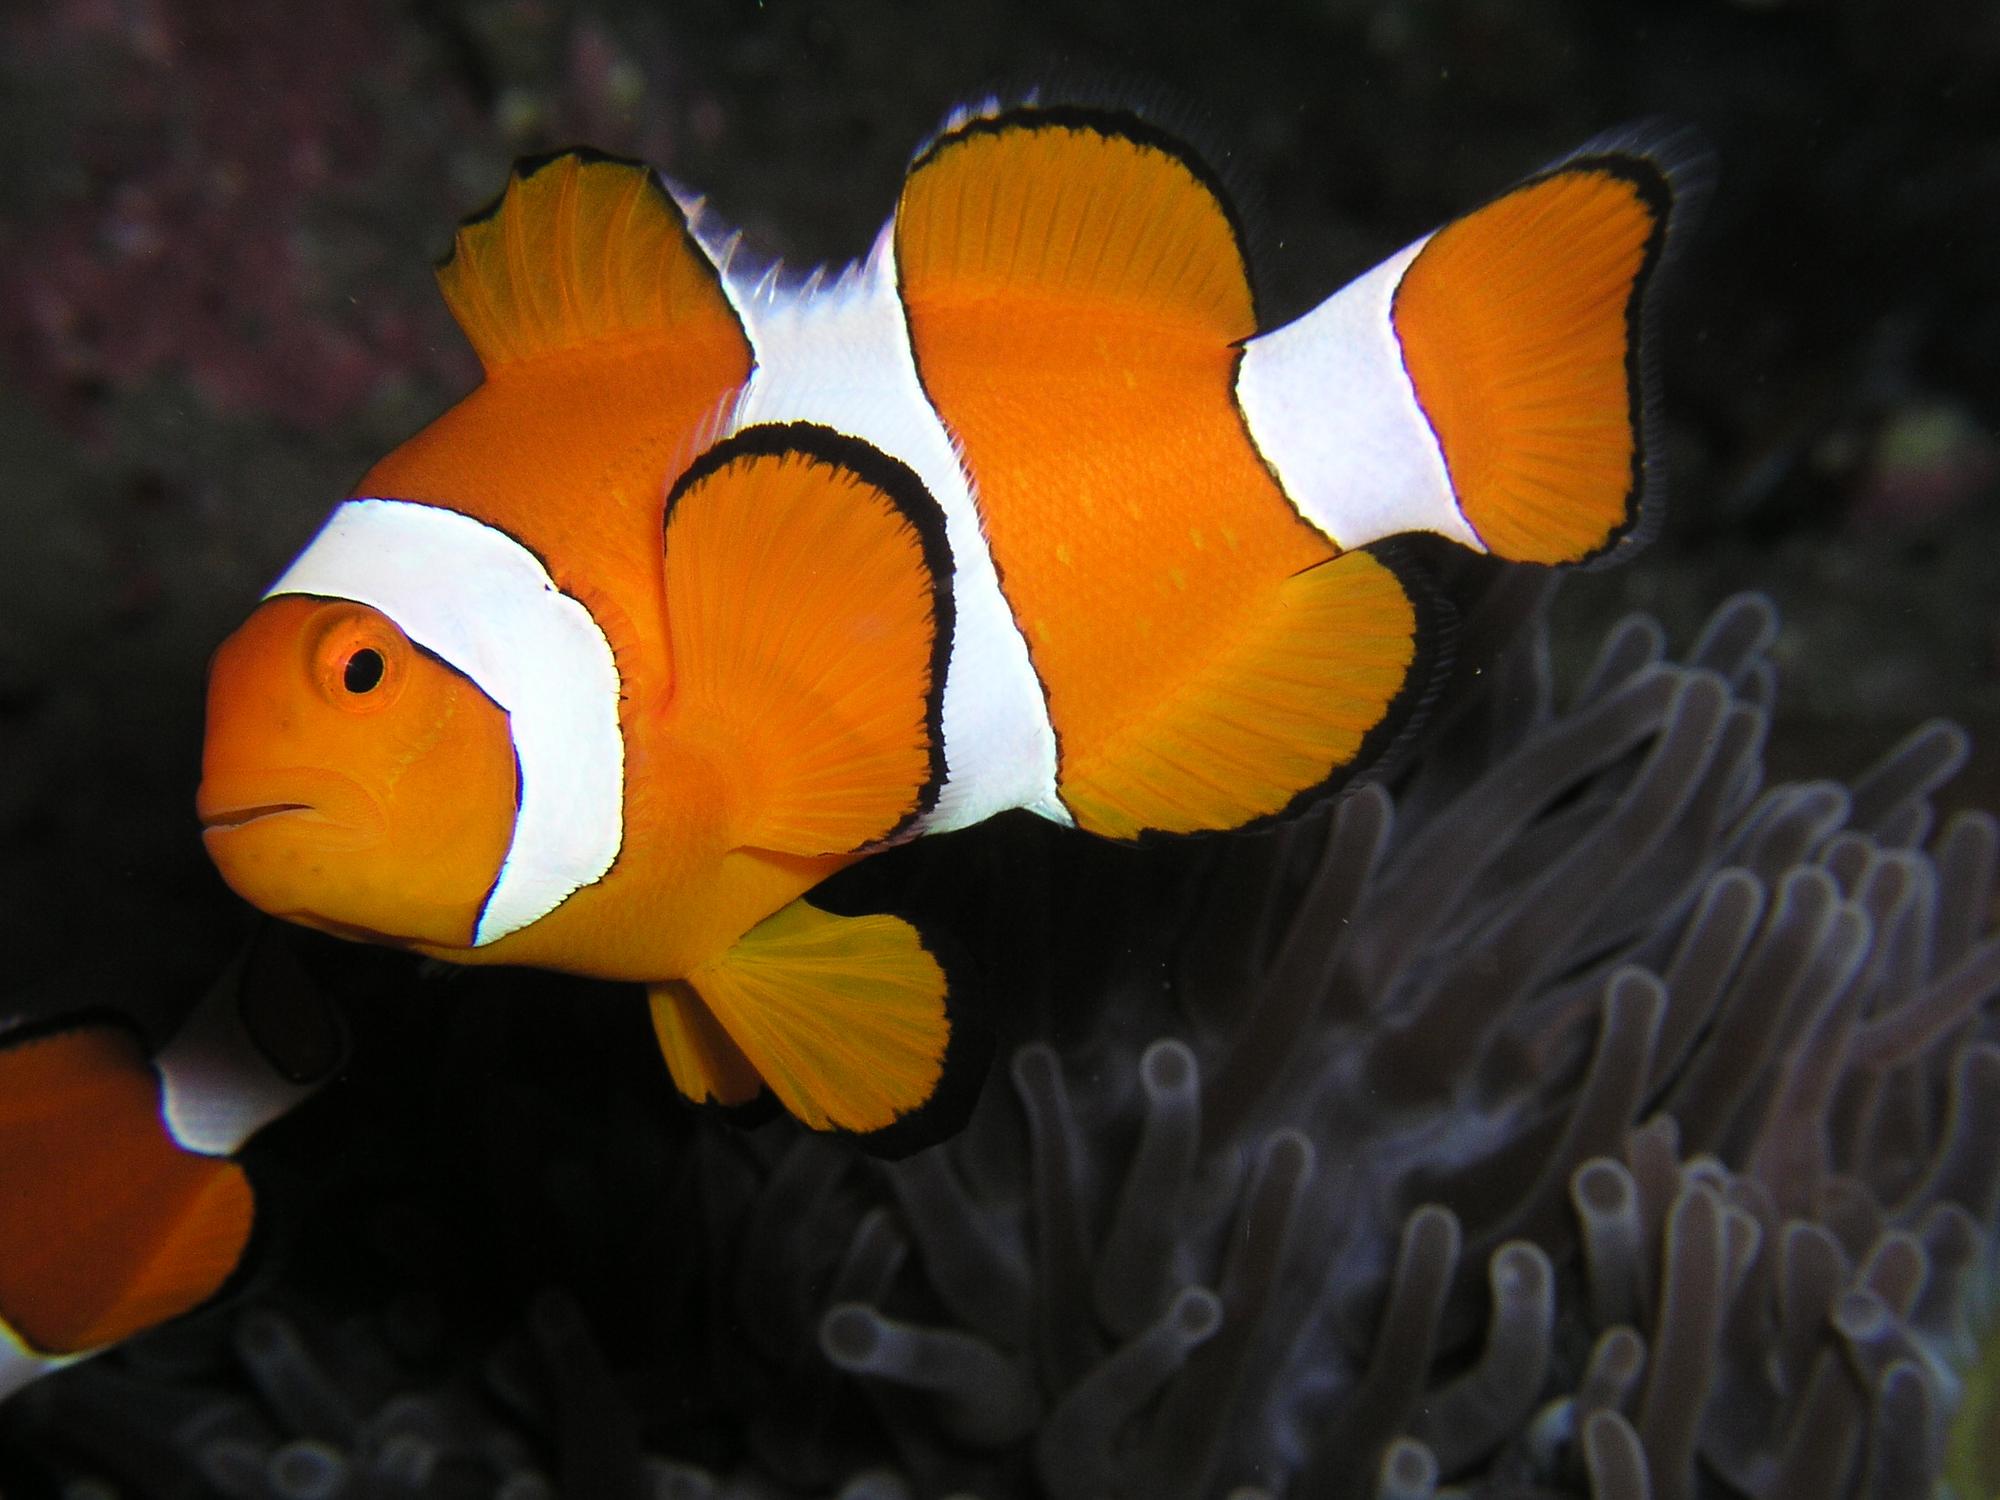 Clown fish - photo#2